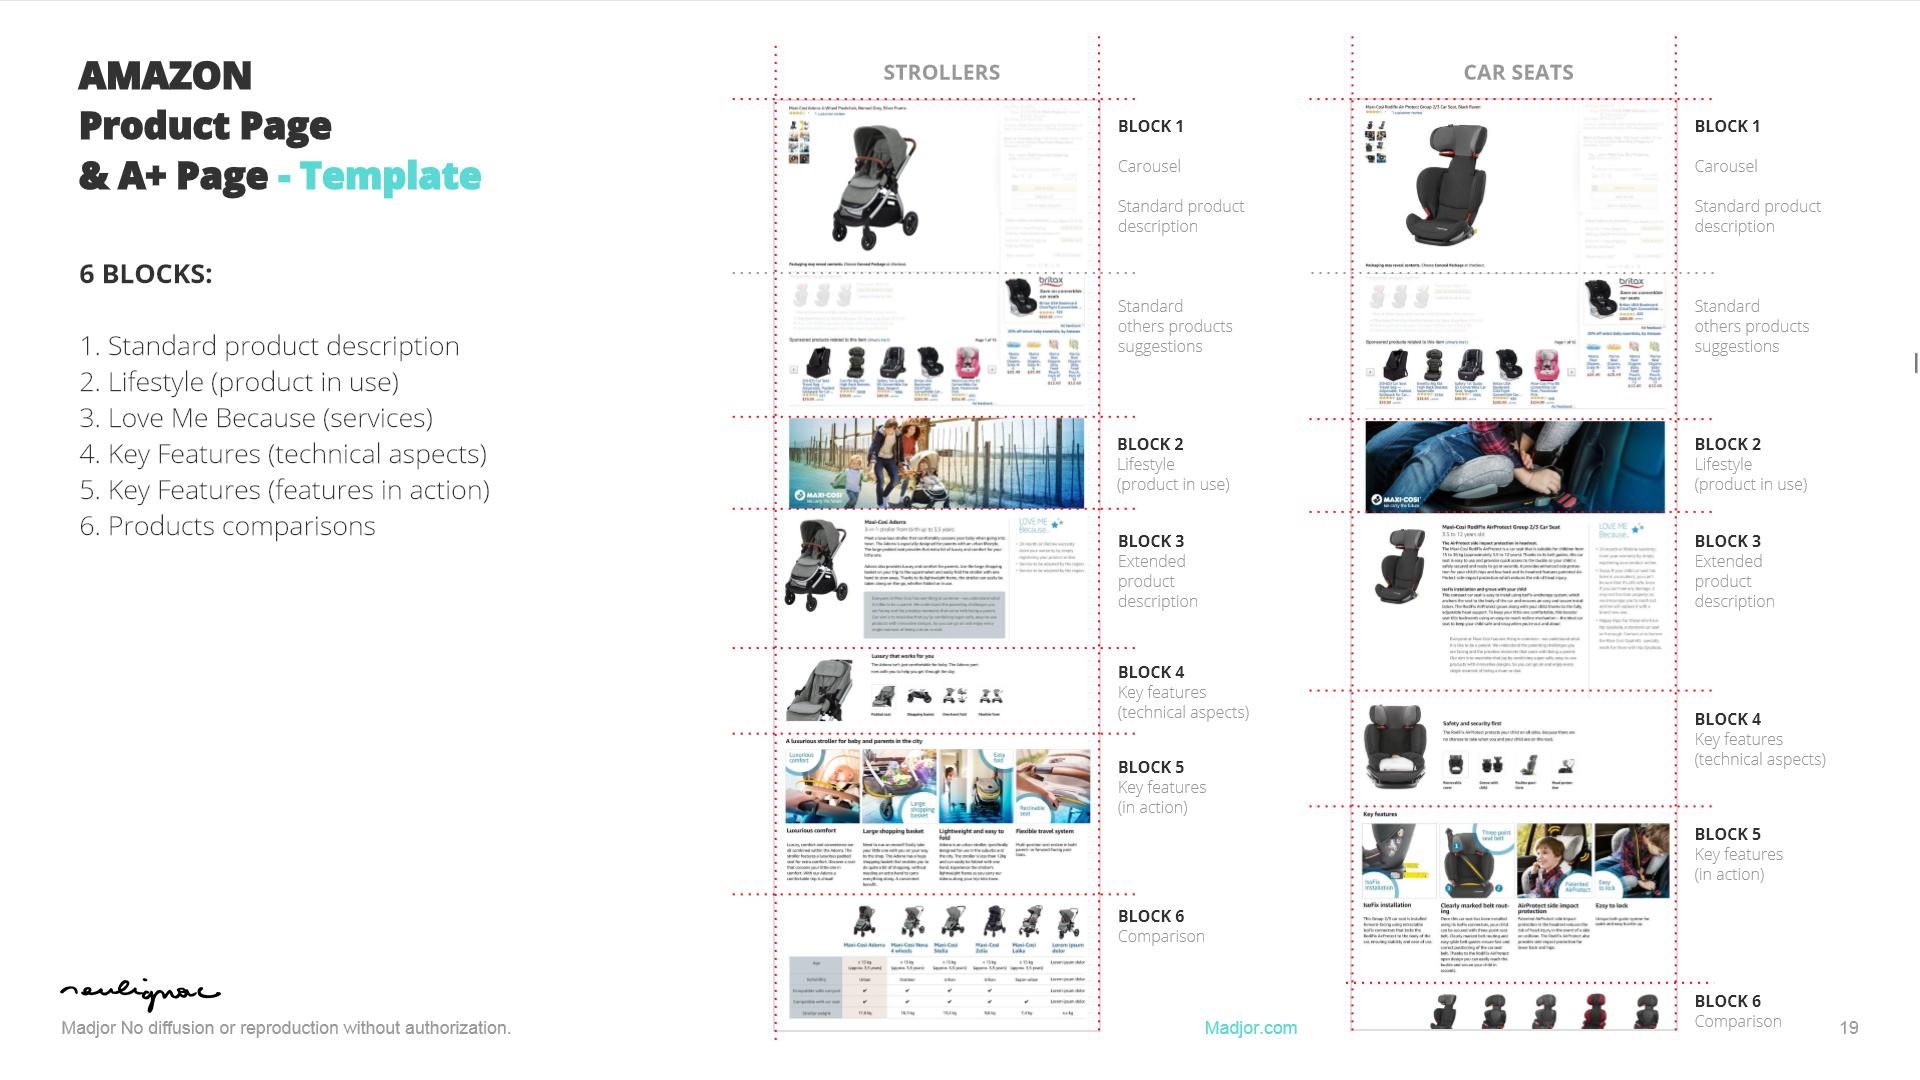 Maxi-Cosi China - Dorel Juvenile - Digital Guidelines - AMAZON Product Page principles- Francois Soulignac, Documents  & Art Direction - MADJOR Labbrand Shanghai, China